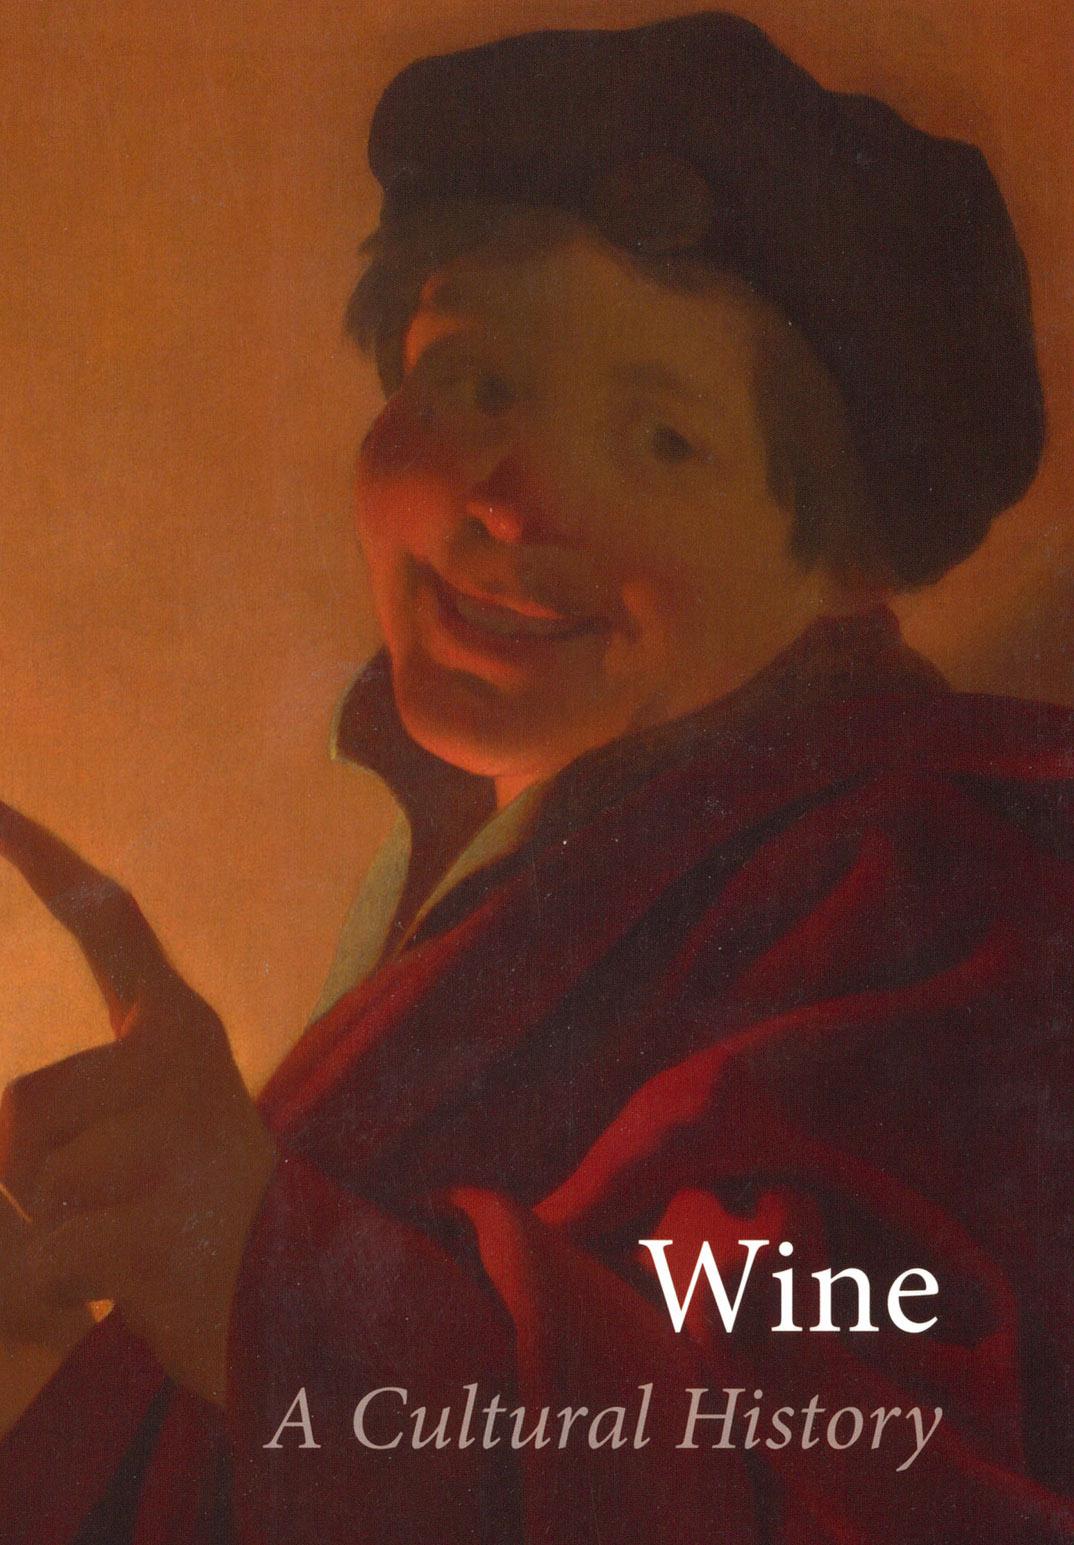 Wine: A Cultural History